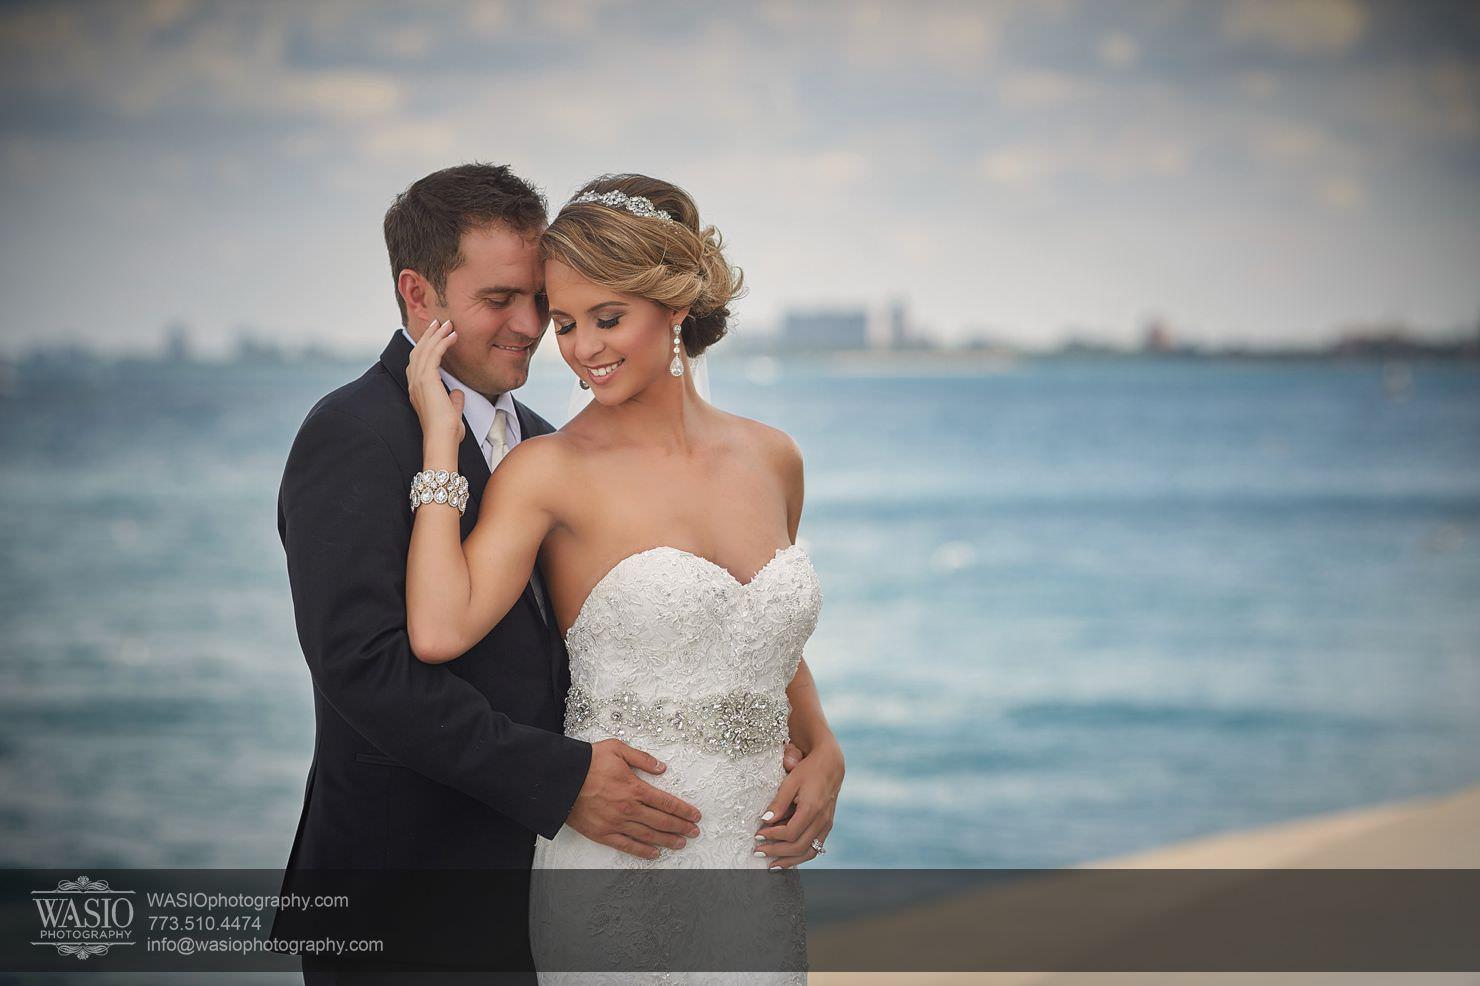 18_Chicago-Summer-Wedding_Angelica-and-Pawel-wedding-1781 Chicago Summer Wedding - Angelica & Pawel